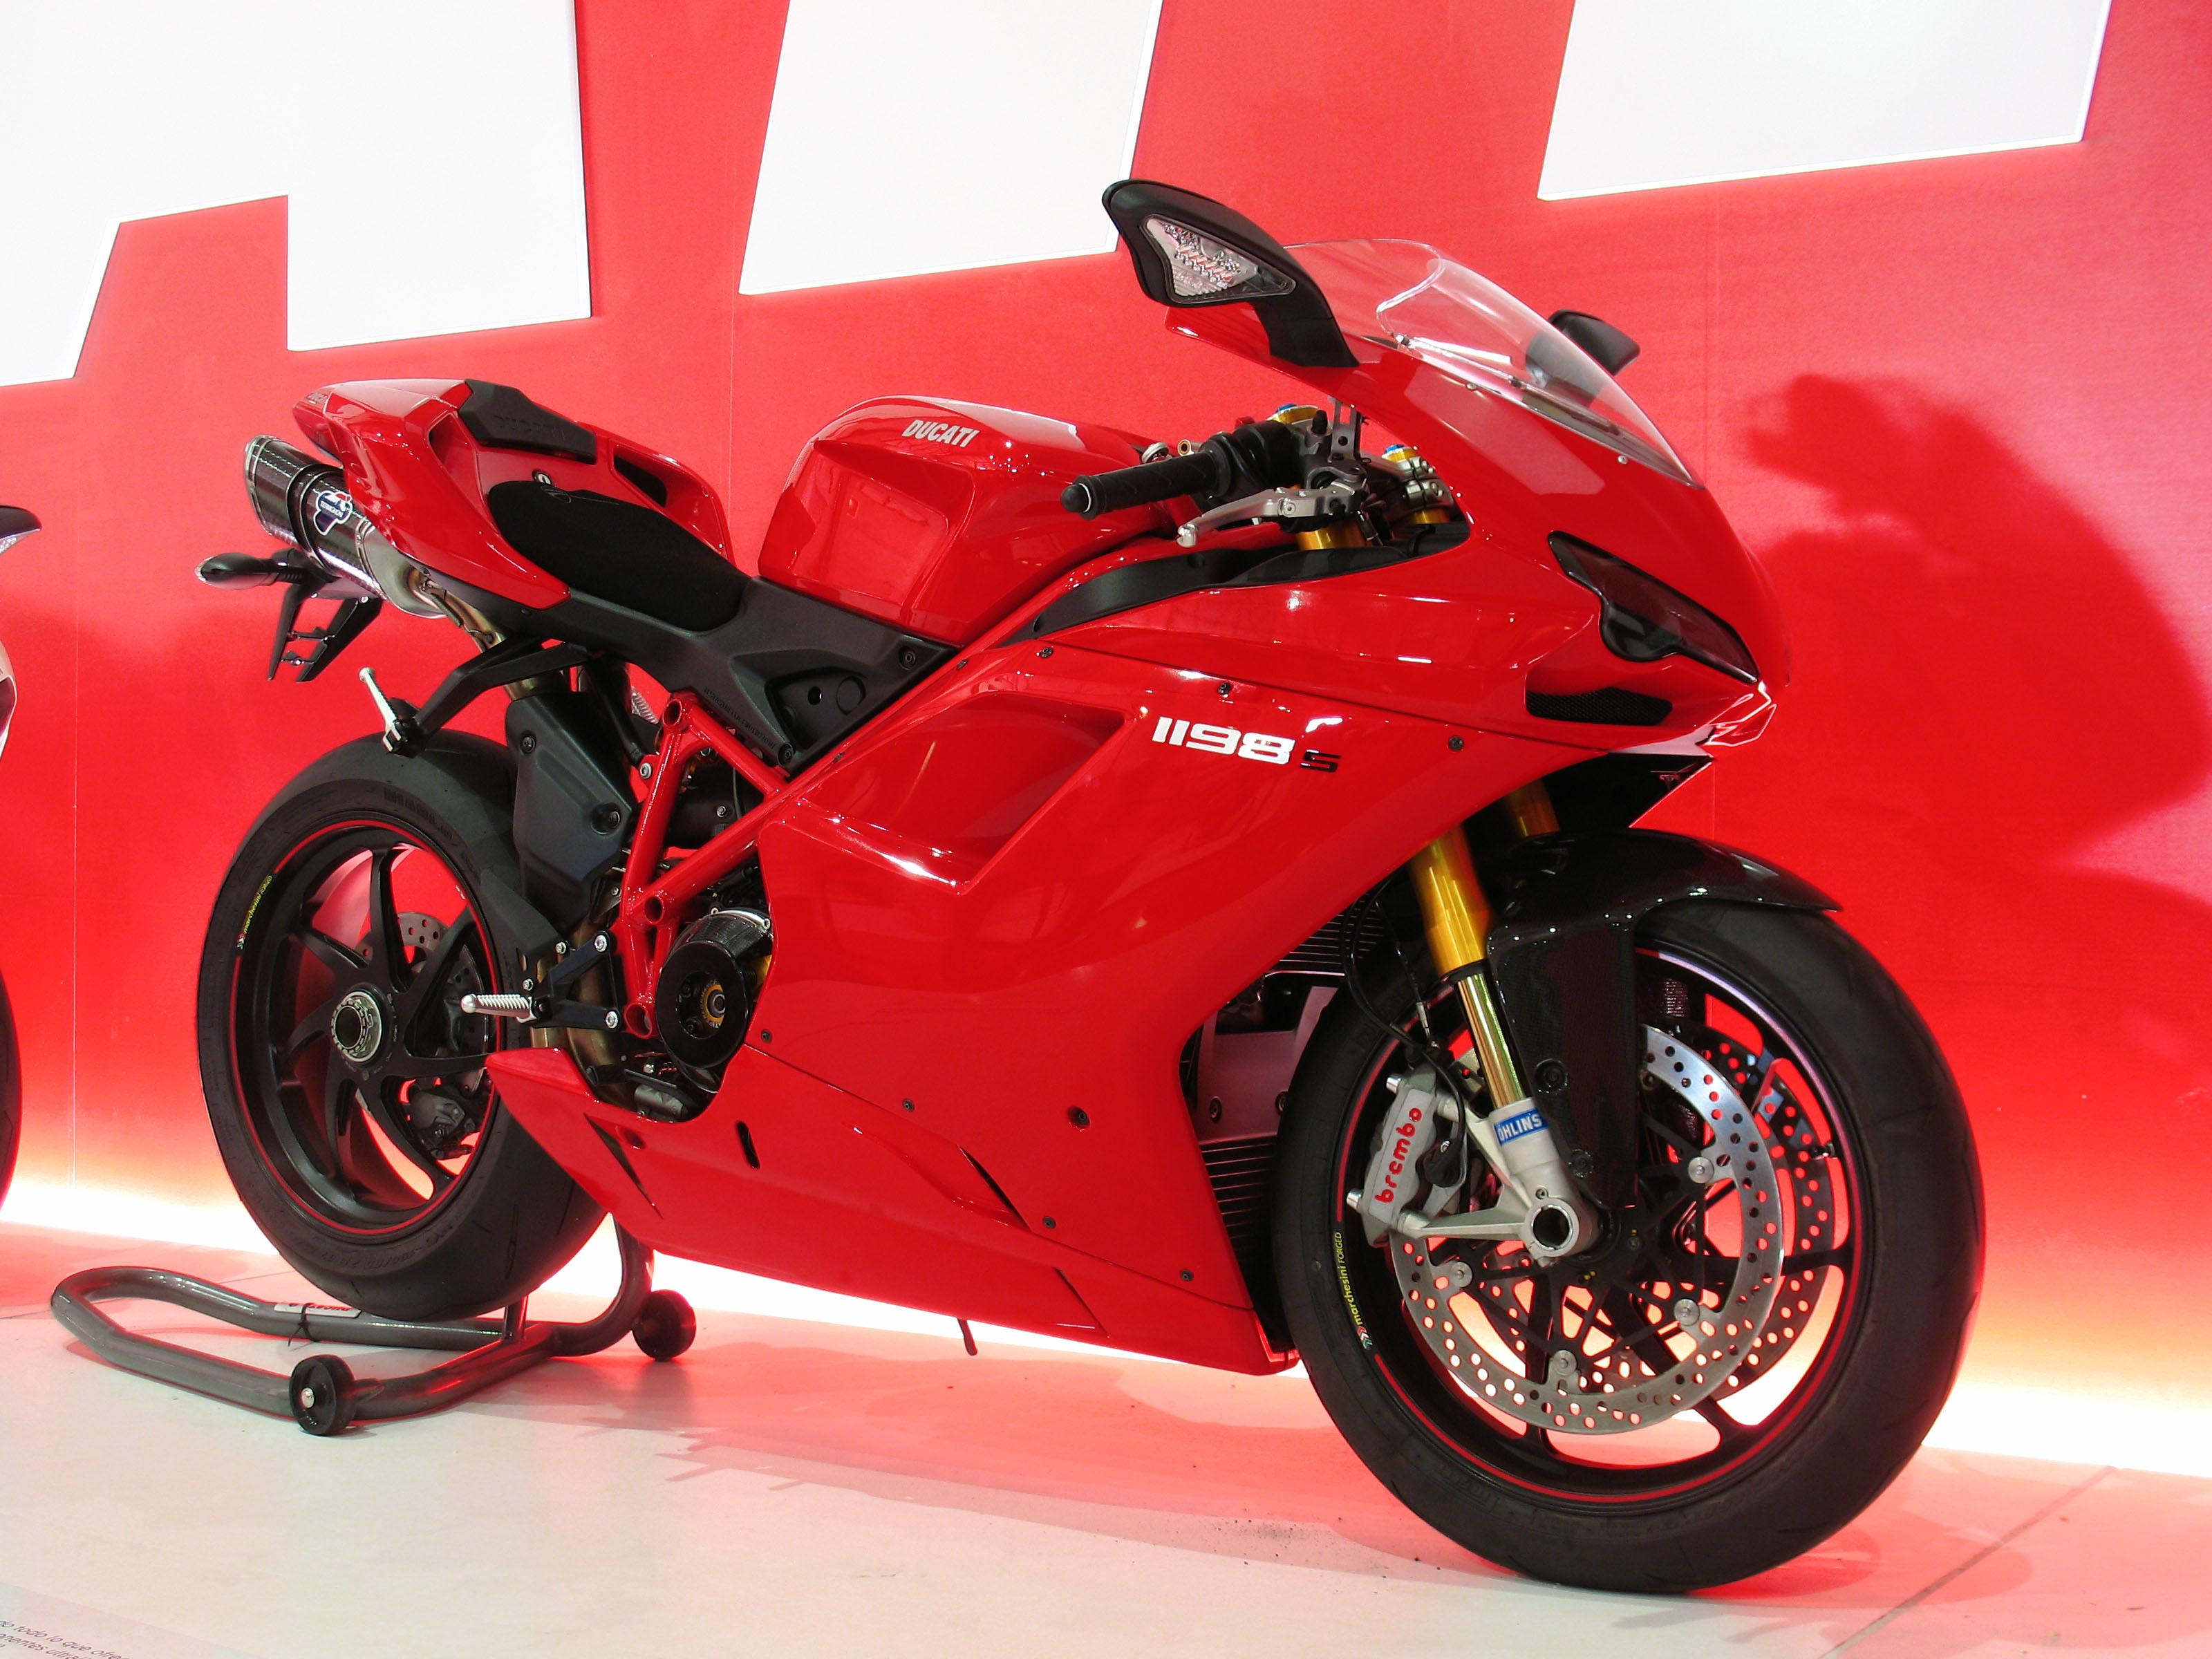 File:Ducati Superbike 1198-S (9660056796).jpg